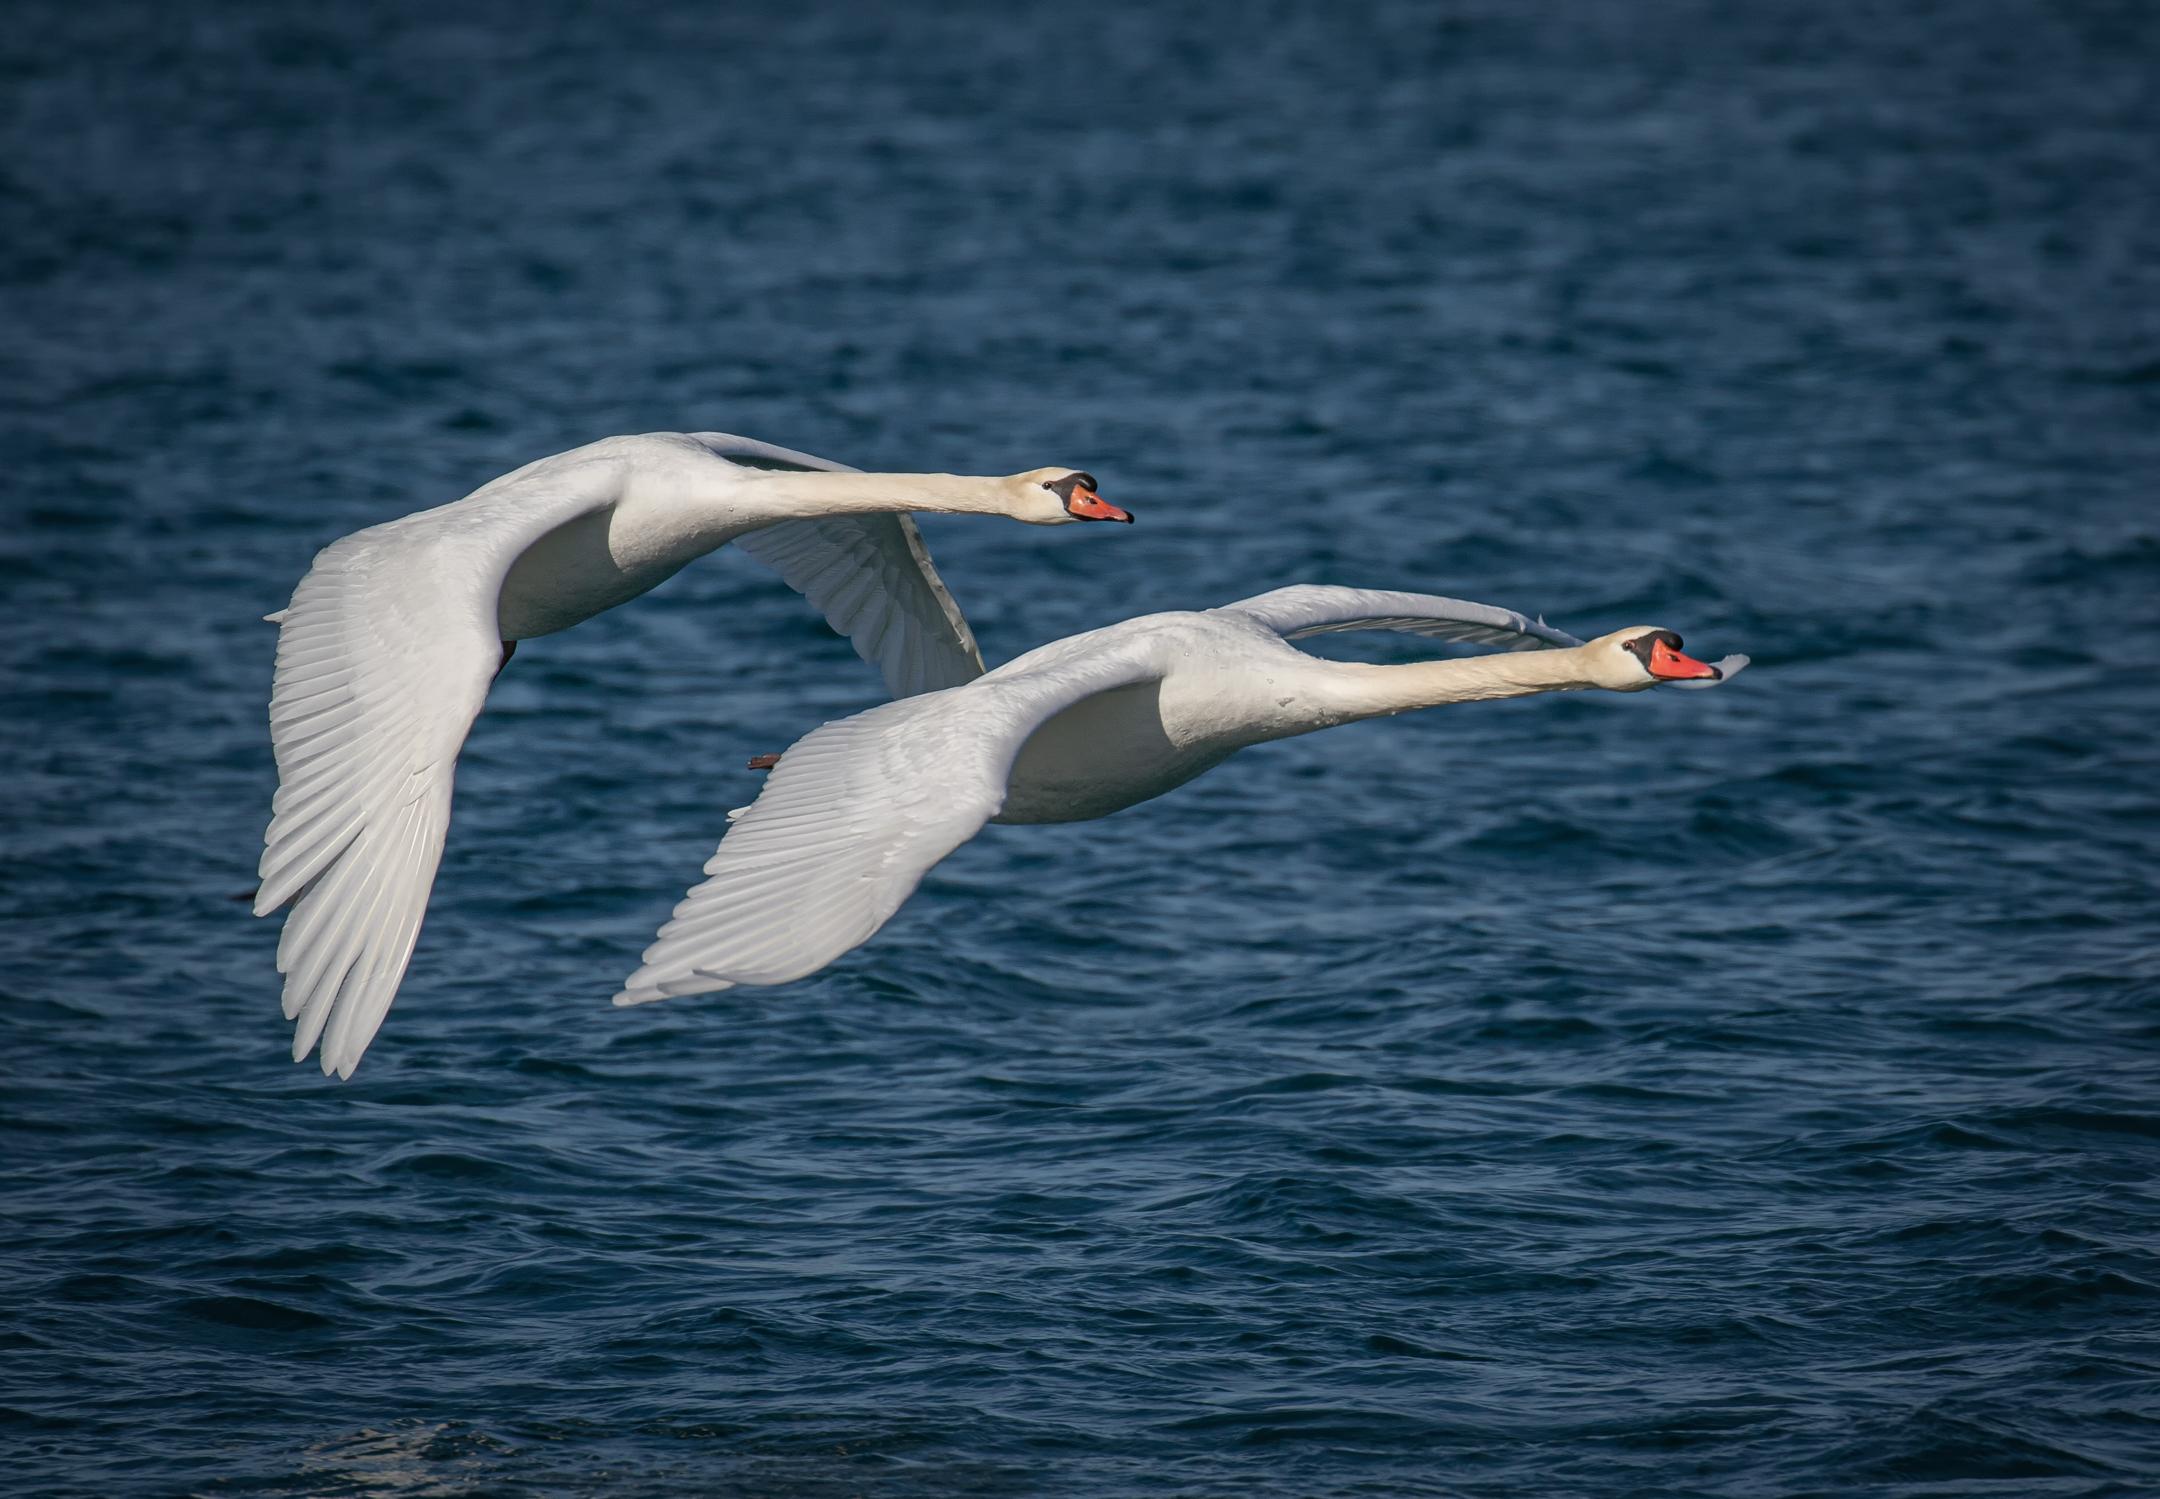 Flying in Tandem....